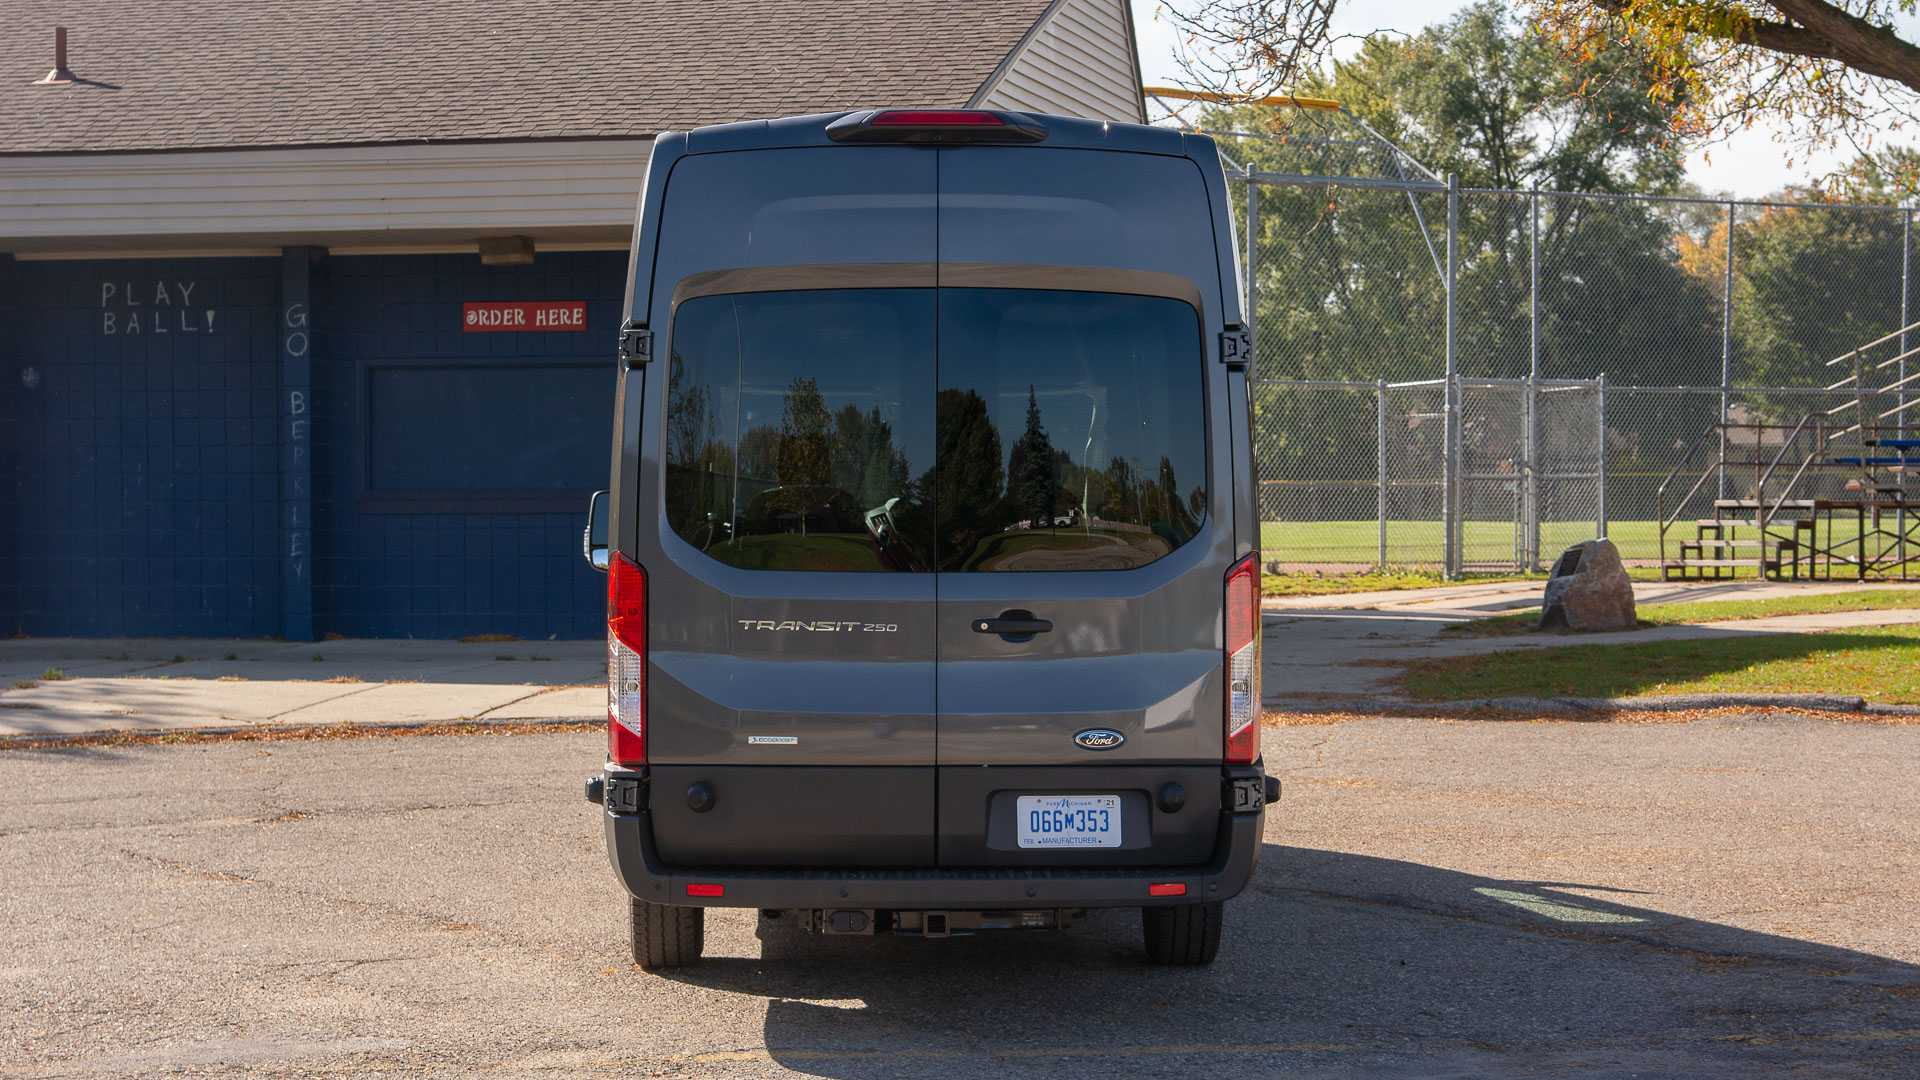 2018 Ford Transit 250HR Cargo Van Review: A Big, Fat Focus